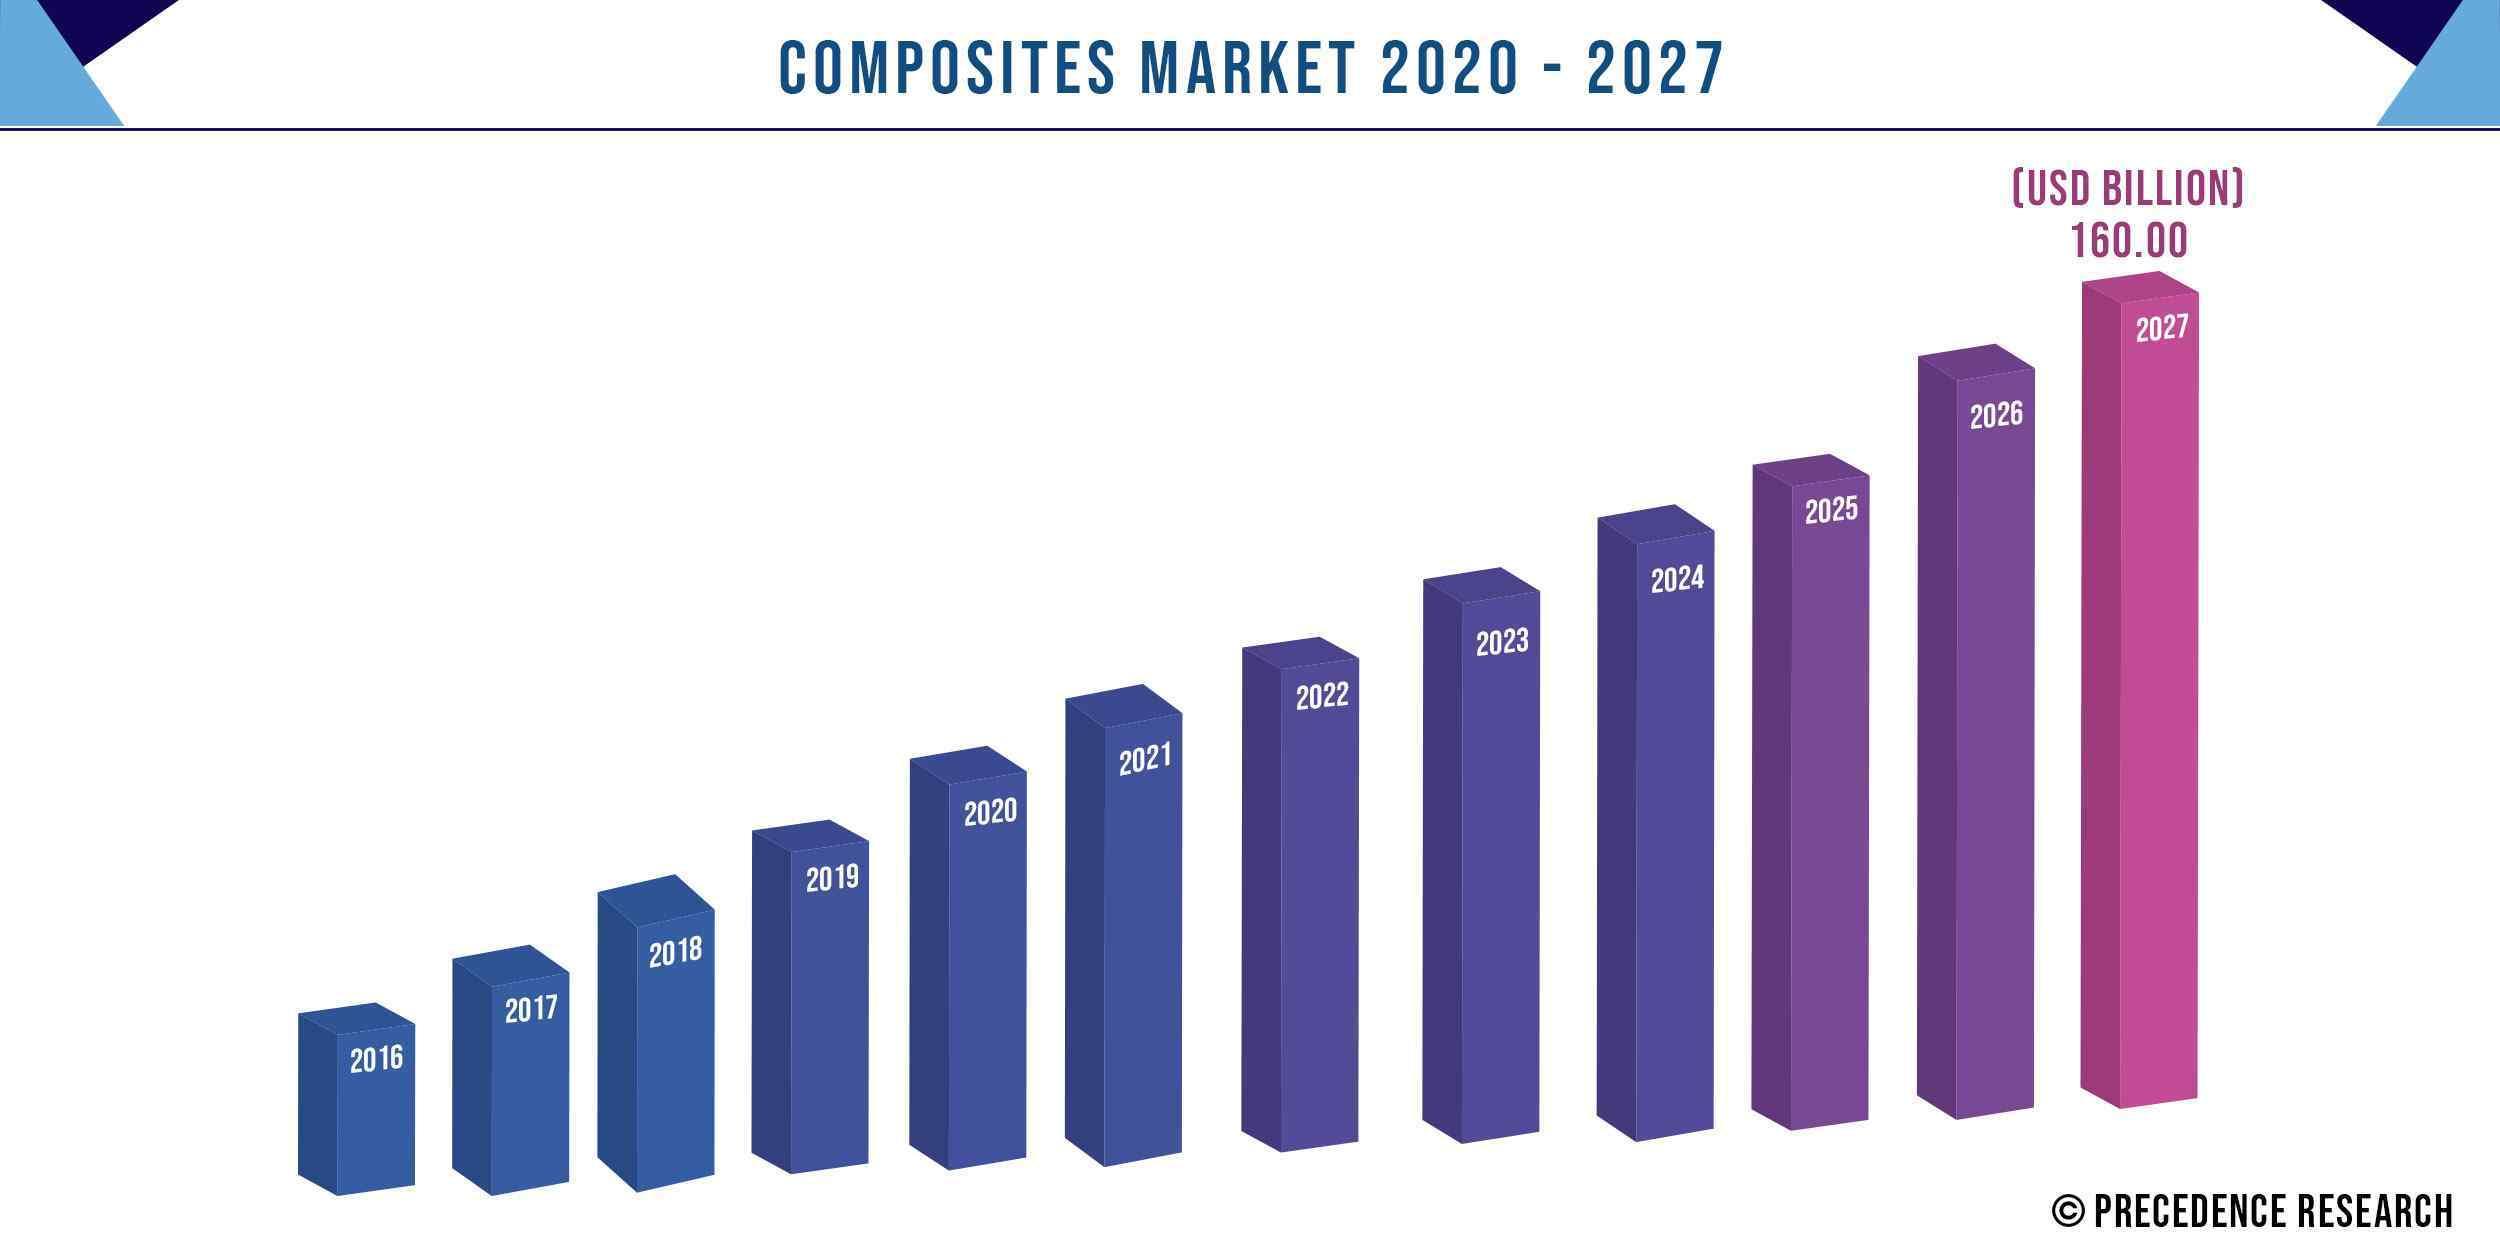 Composites Market Size 2016 to 2027